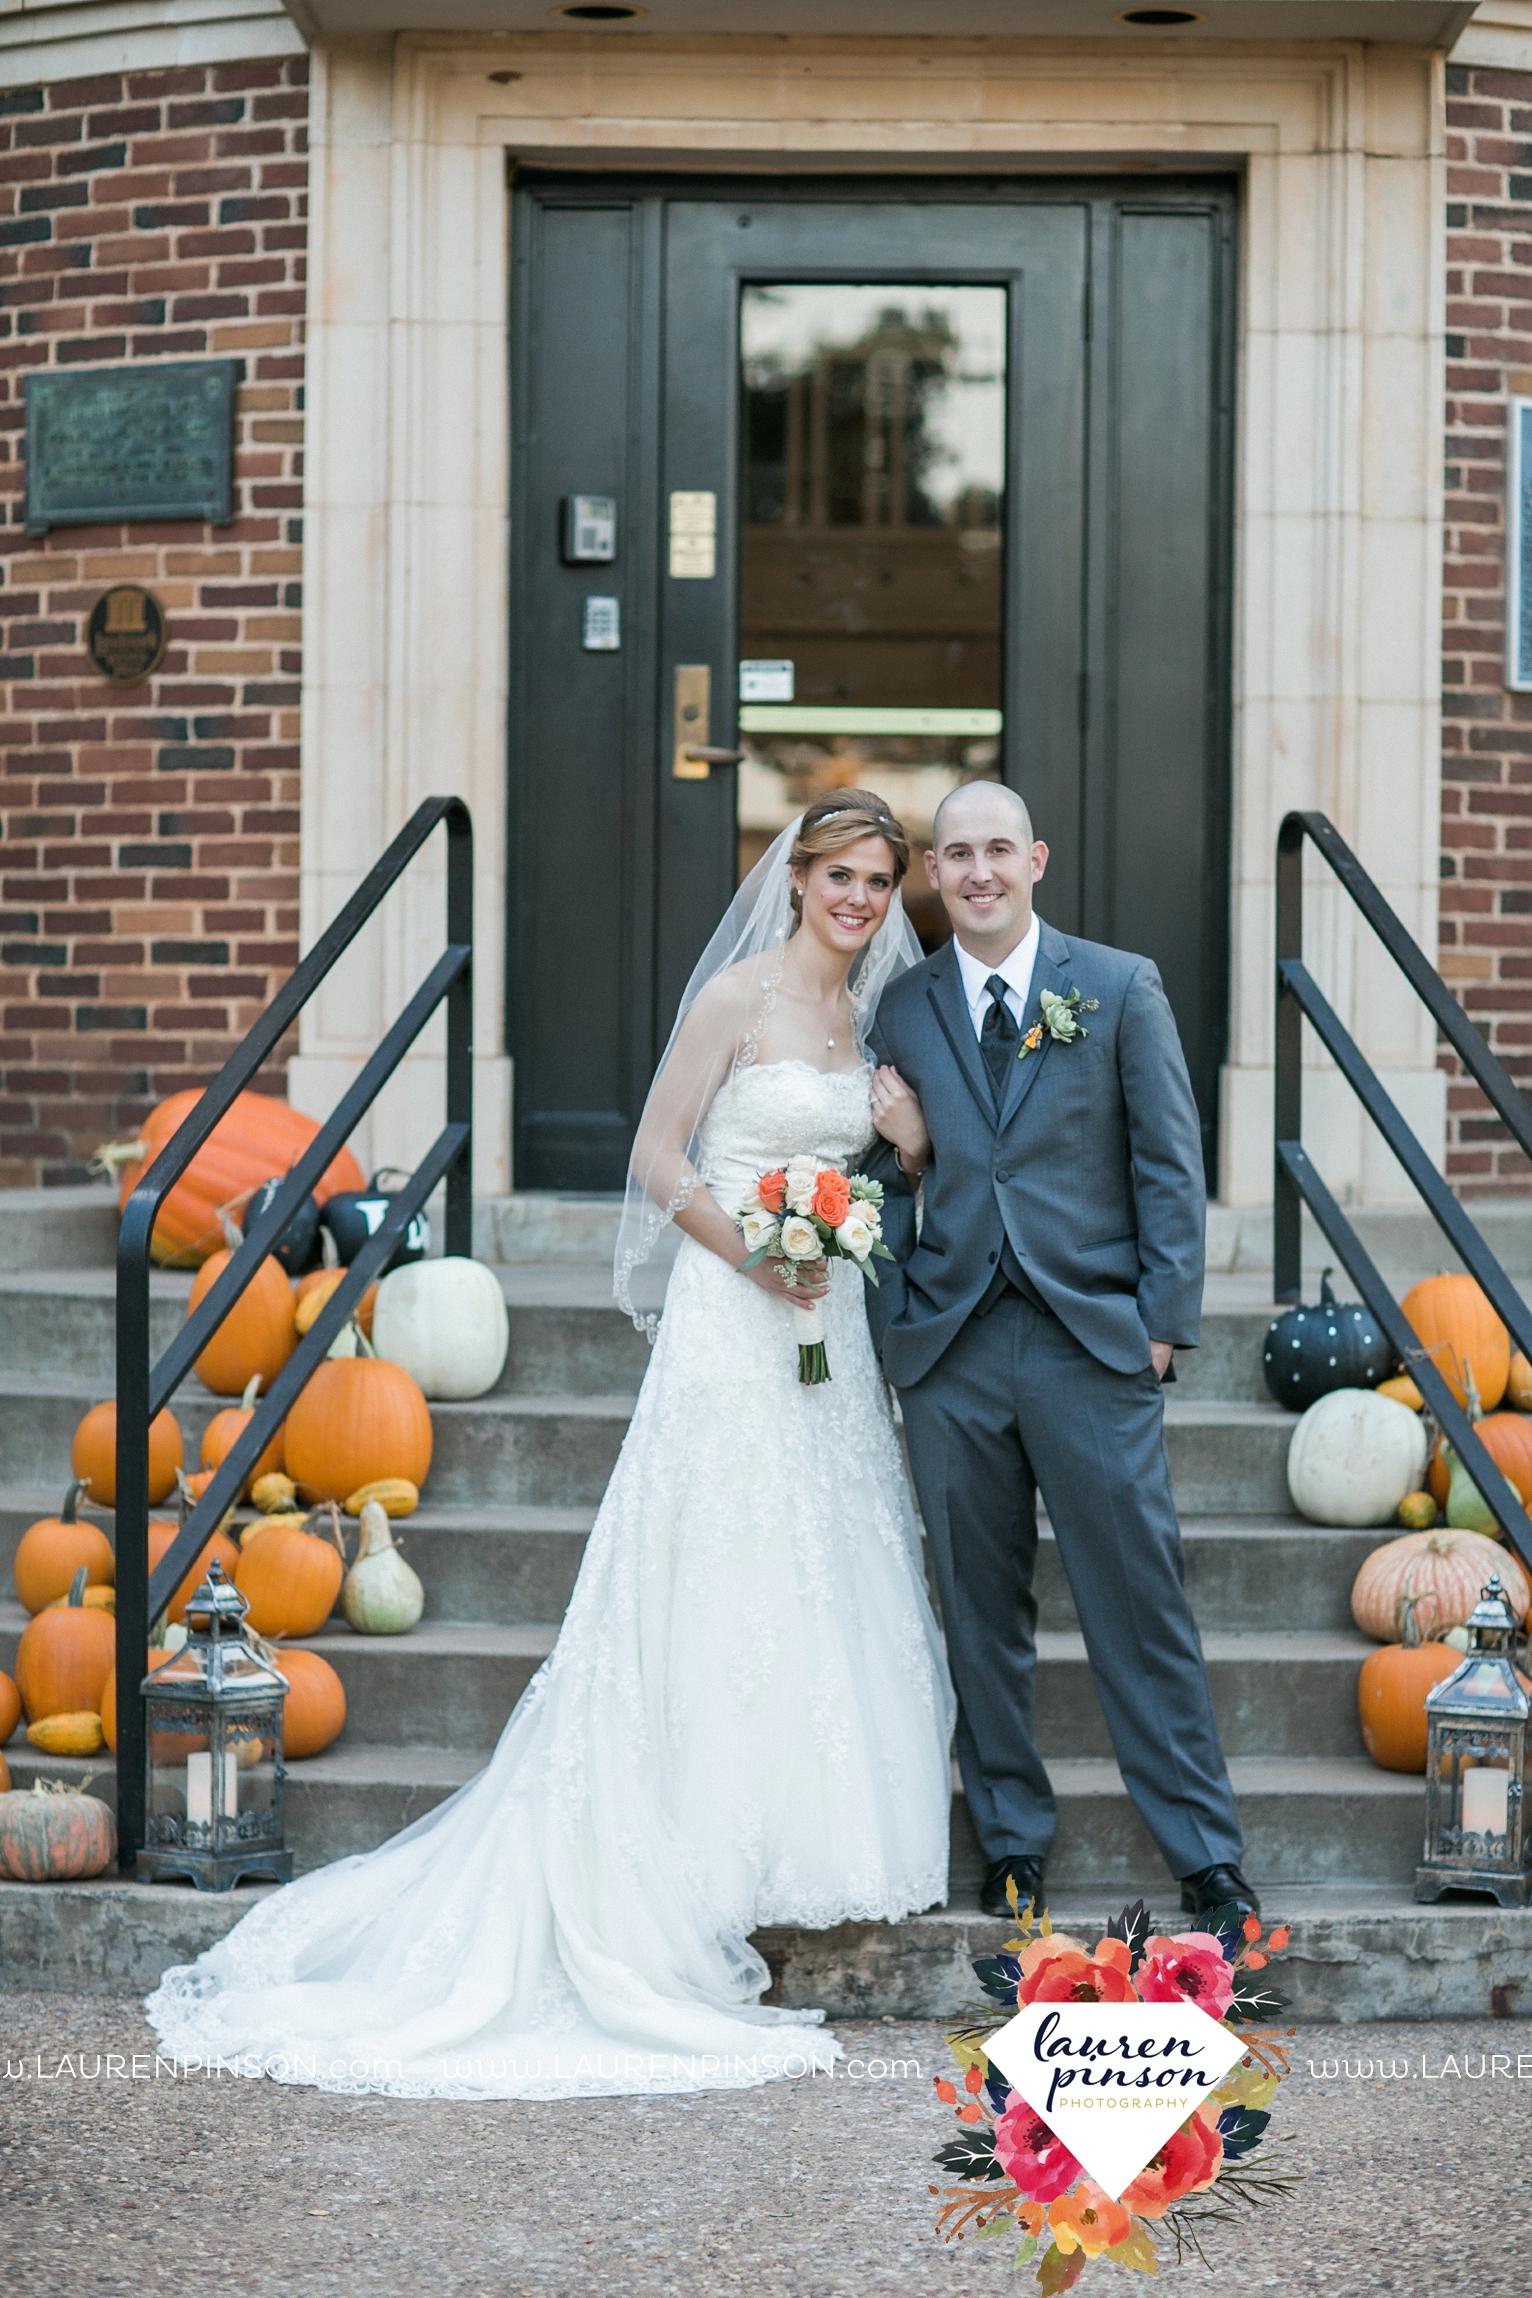 kemp-center-for-the-arts-wichita-falls-texas-wedding-photographer-fall-wedding-pumpkins-176.jpg